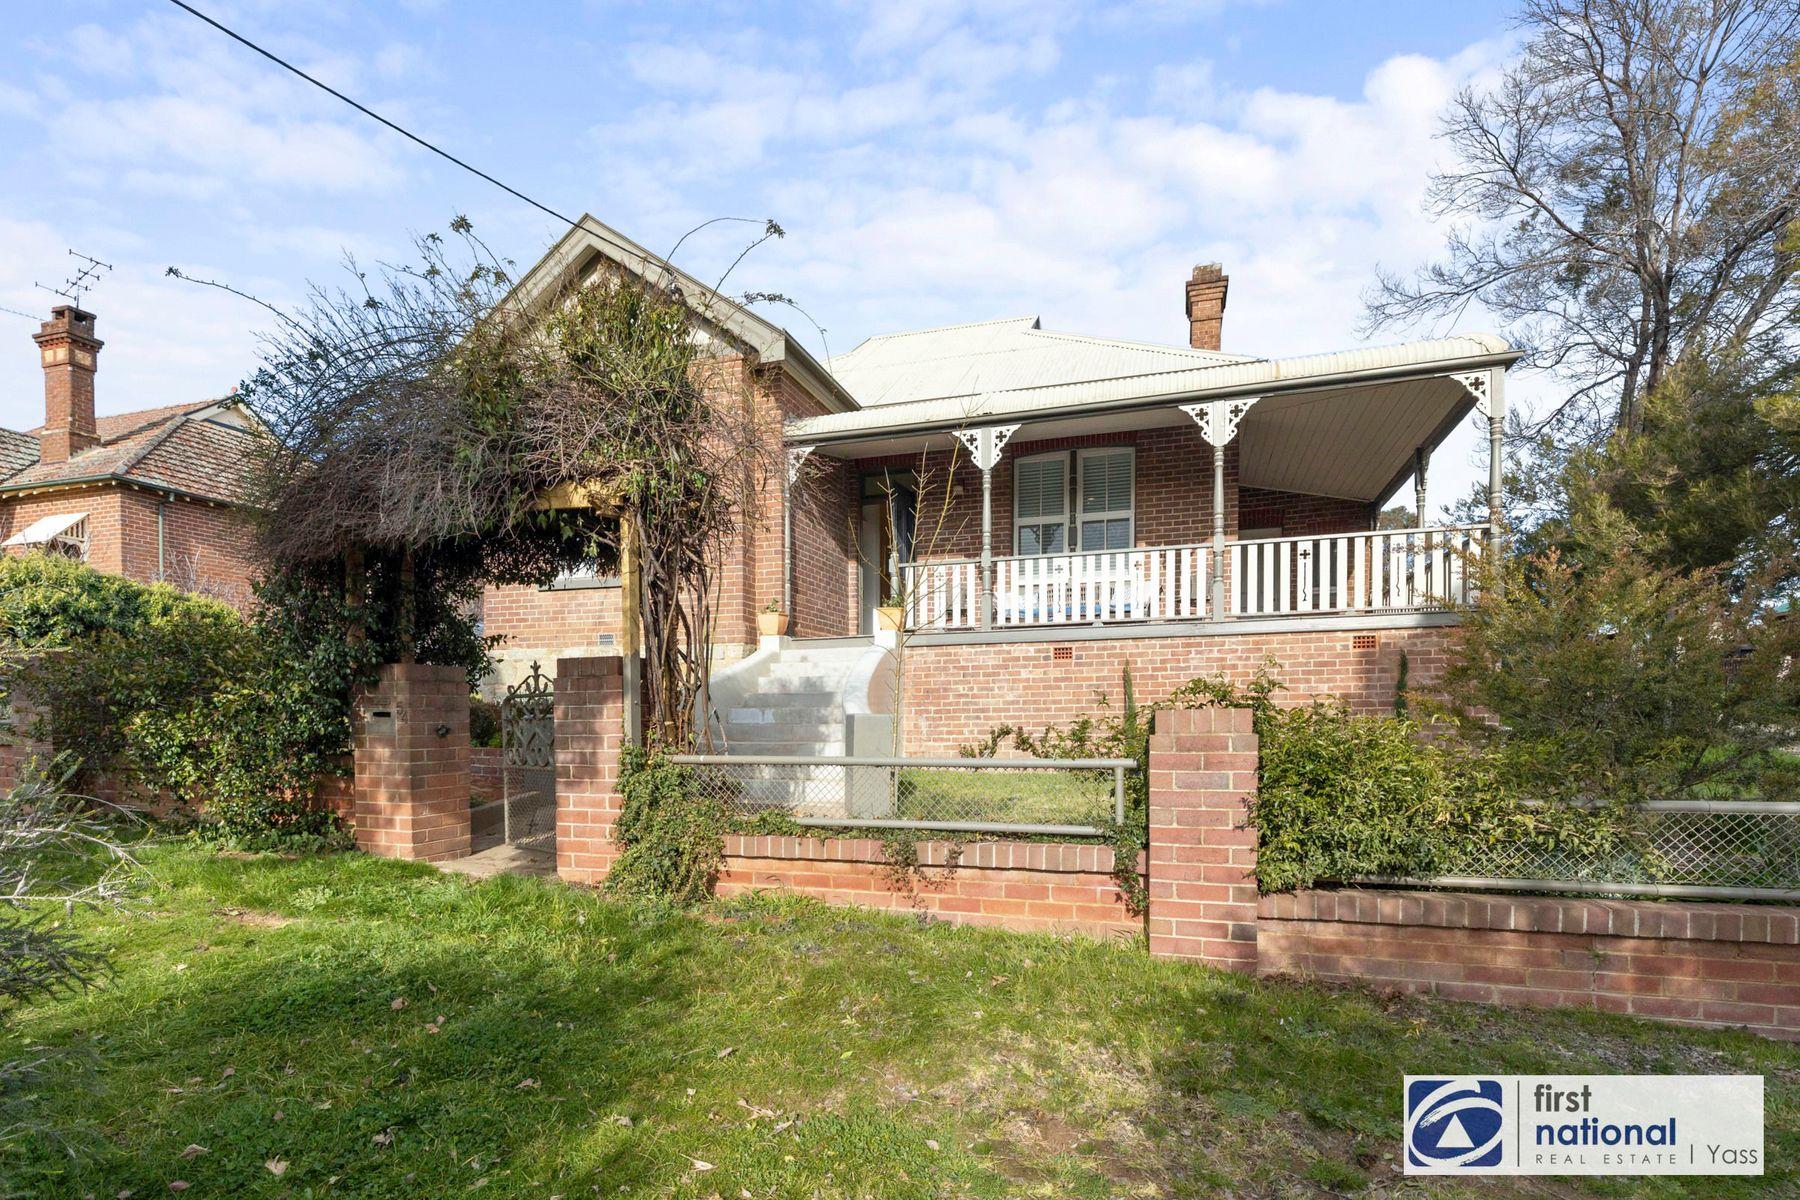 54 Lead Street, Yass, NSW 2582